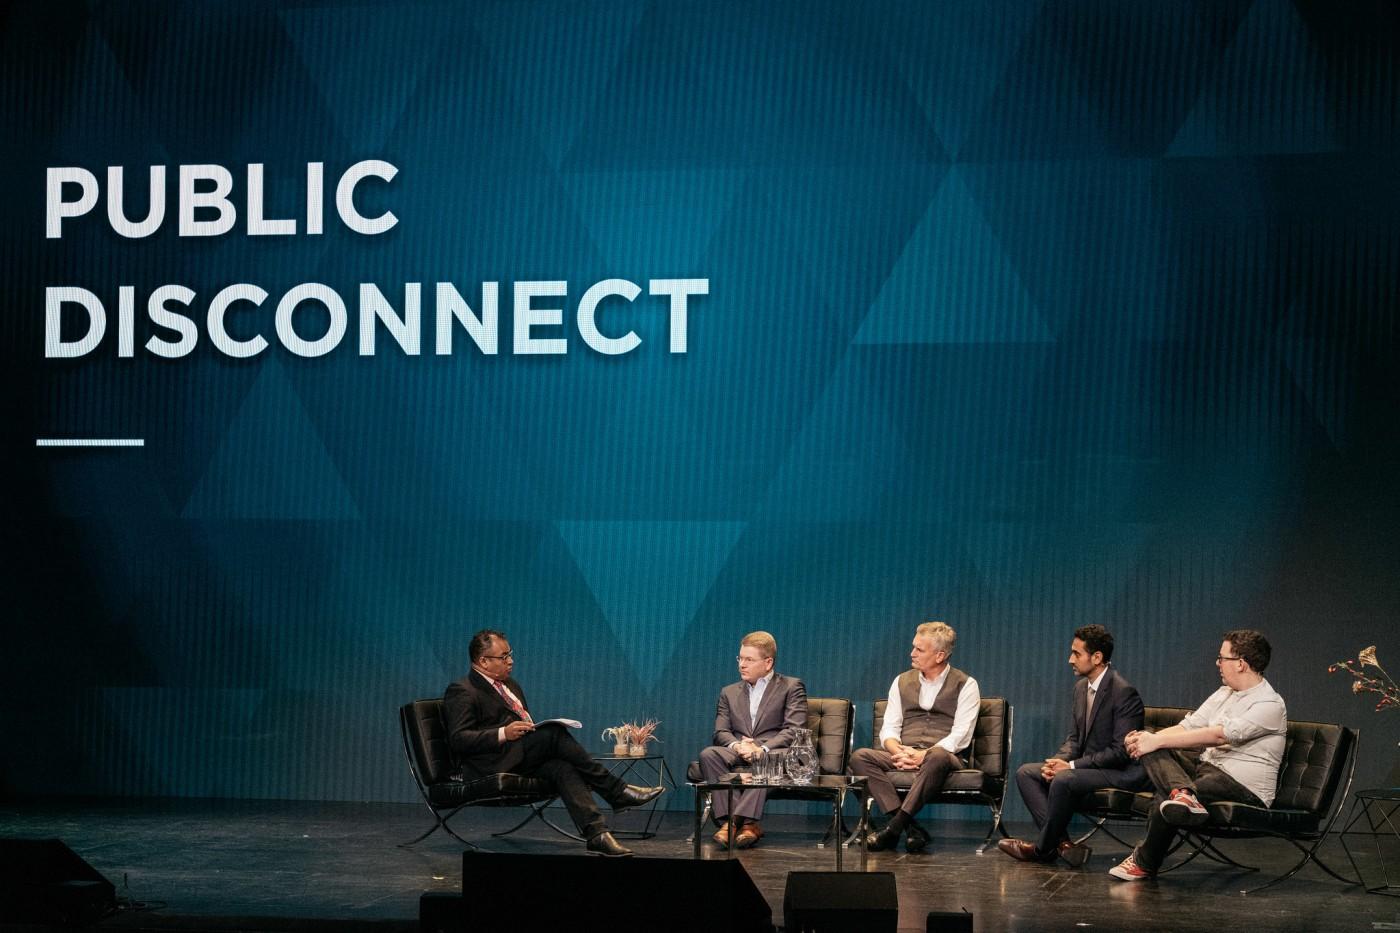 Krishnan Guru-Murthy, de Channel 4 News, modera una sesión de NewsXchange con Sam Feist, de la CNN; Ulrik Haagerup, de Constructive Institute; Waleed Aly, de Ten Network; y James Ball, periodista. FOTO: STEFANO SANTUCCI PARA NEWSXCHANGE.